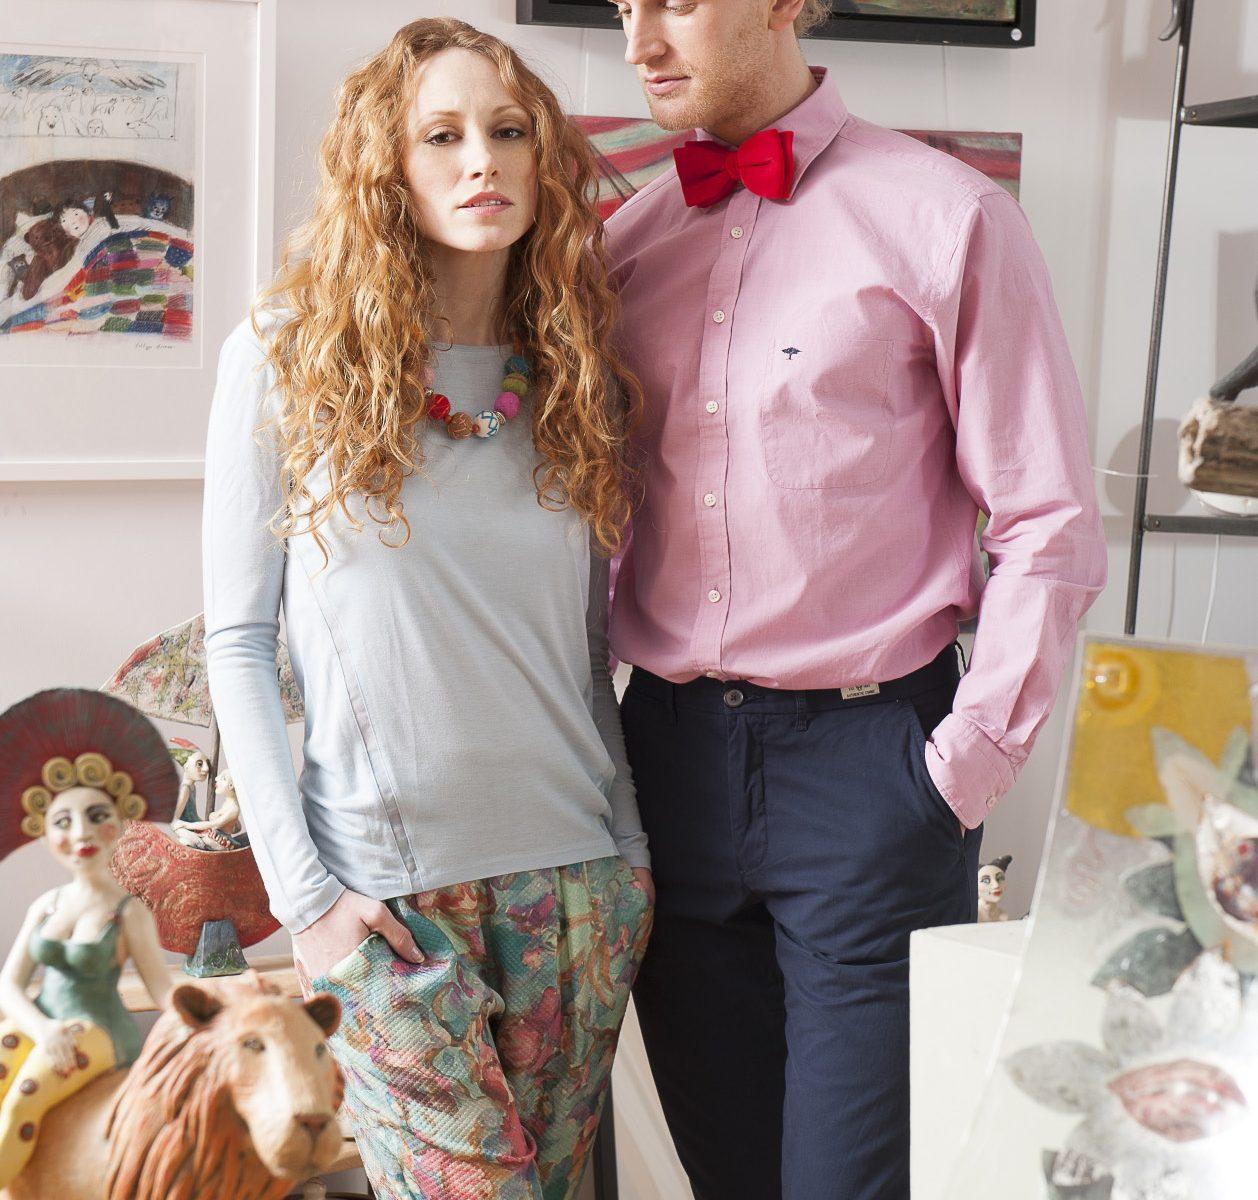 anine: Farhi by Nicole Farhi long sleeved top, £85, Hoss Intropia silk trousers, £159, Figis, Tenterden 01580 762536 www.figisboutique.com; The Laughing Thimble necklace, £22.50, Singing Soul Gallery (details opposite) Dan: Fynch Hatton pink shirt, £65, Hunt & Holditch velvet bow tie, £22.50, County Clothes, Tenterden 01580 765159 / Canterbury 01227 765294 / Reigate 01737 249224 www.countyclothesmenswear.co.uk; Tommy Hilfiger chinos, £85, Fenwick, Tunbridge Wells 01892 516716 www.fenwick.co.uk